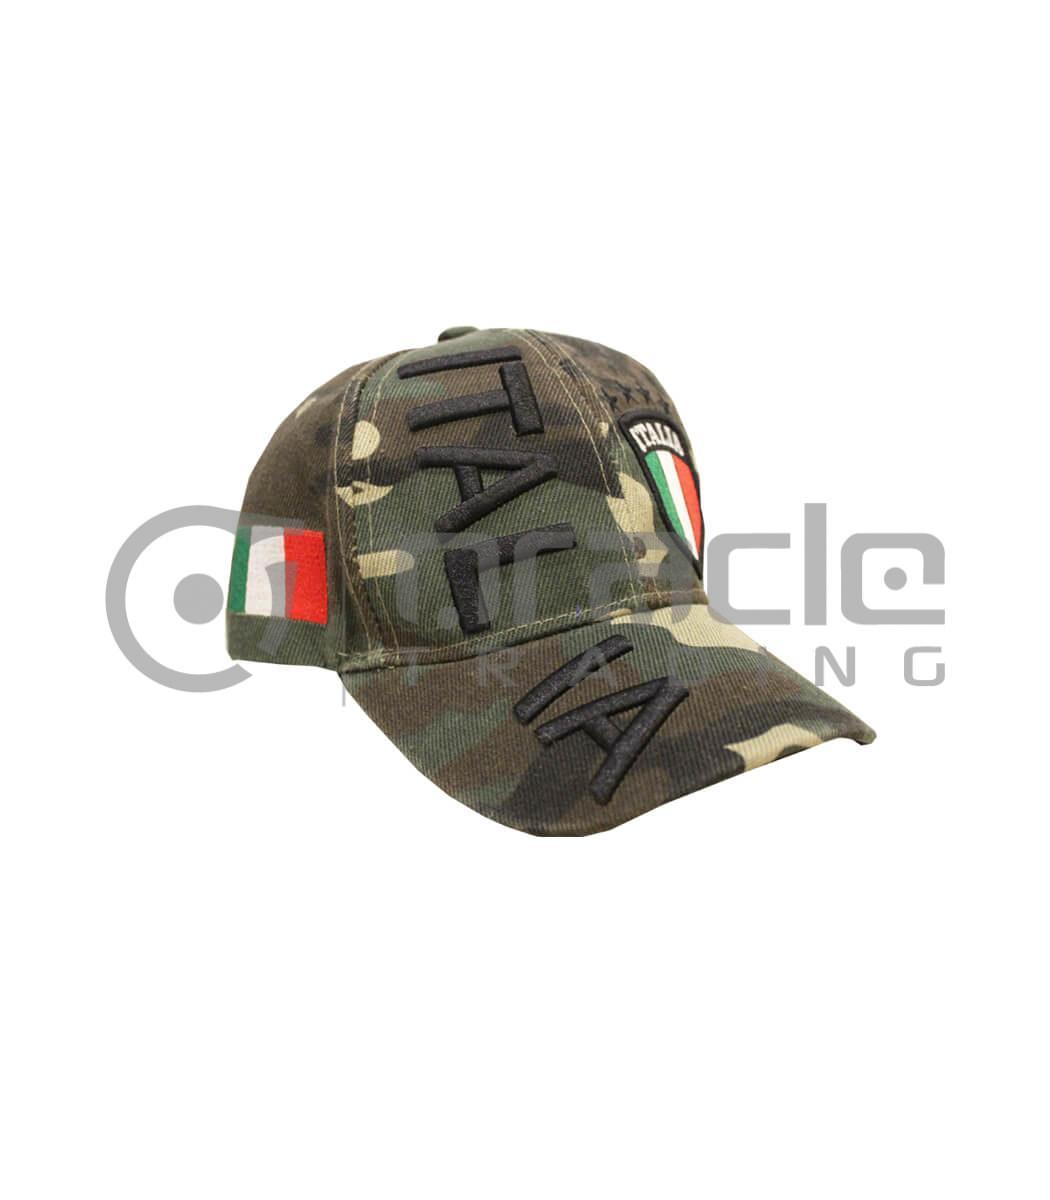 3D Italia Hat - Green Camo - Kid Size